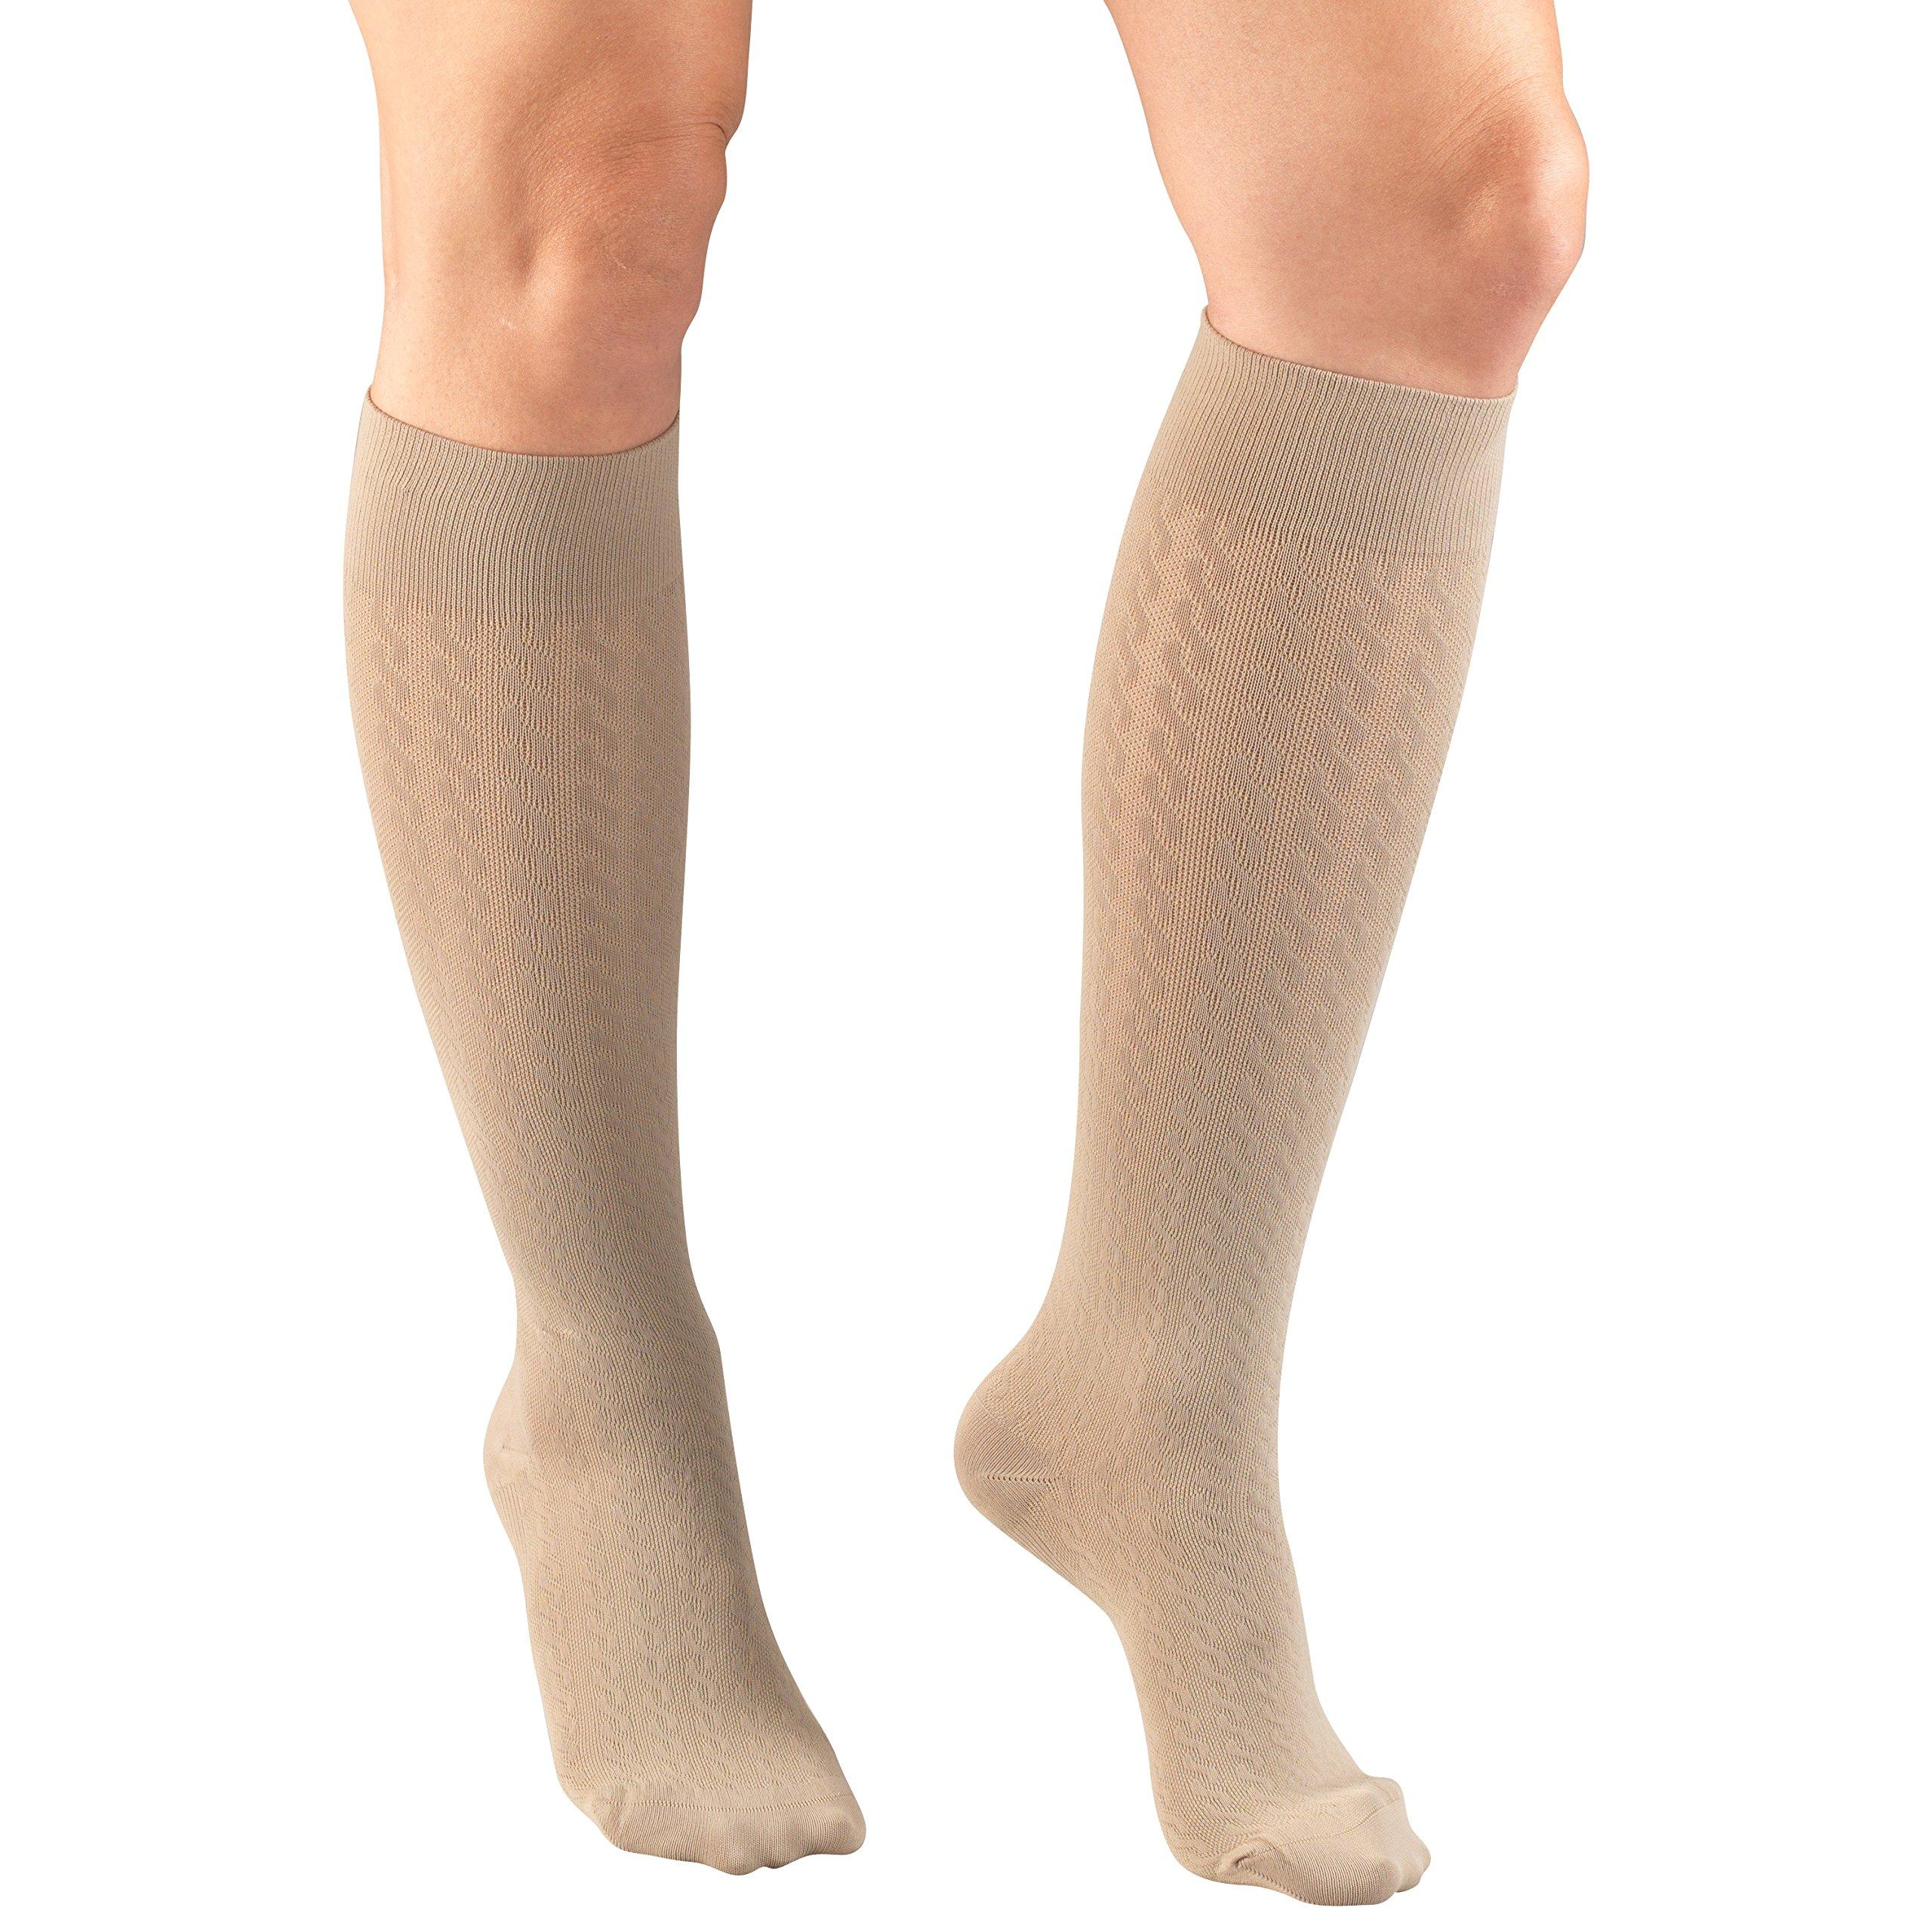 Truform Compression Socks for Women, 15-20 mmHg, Tan Cable Pattern, Medium